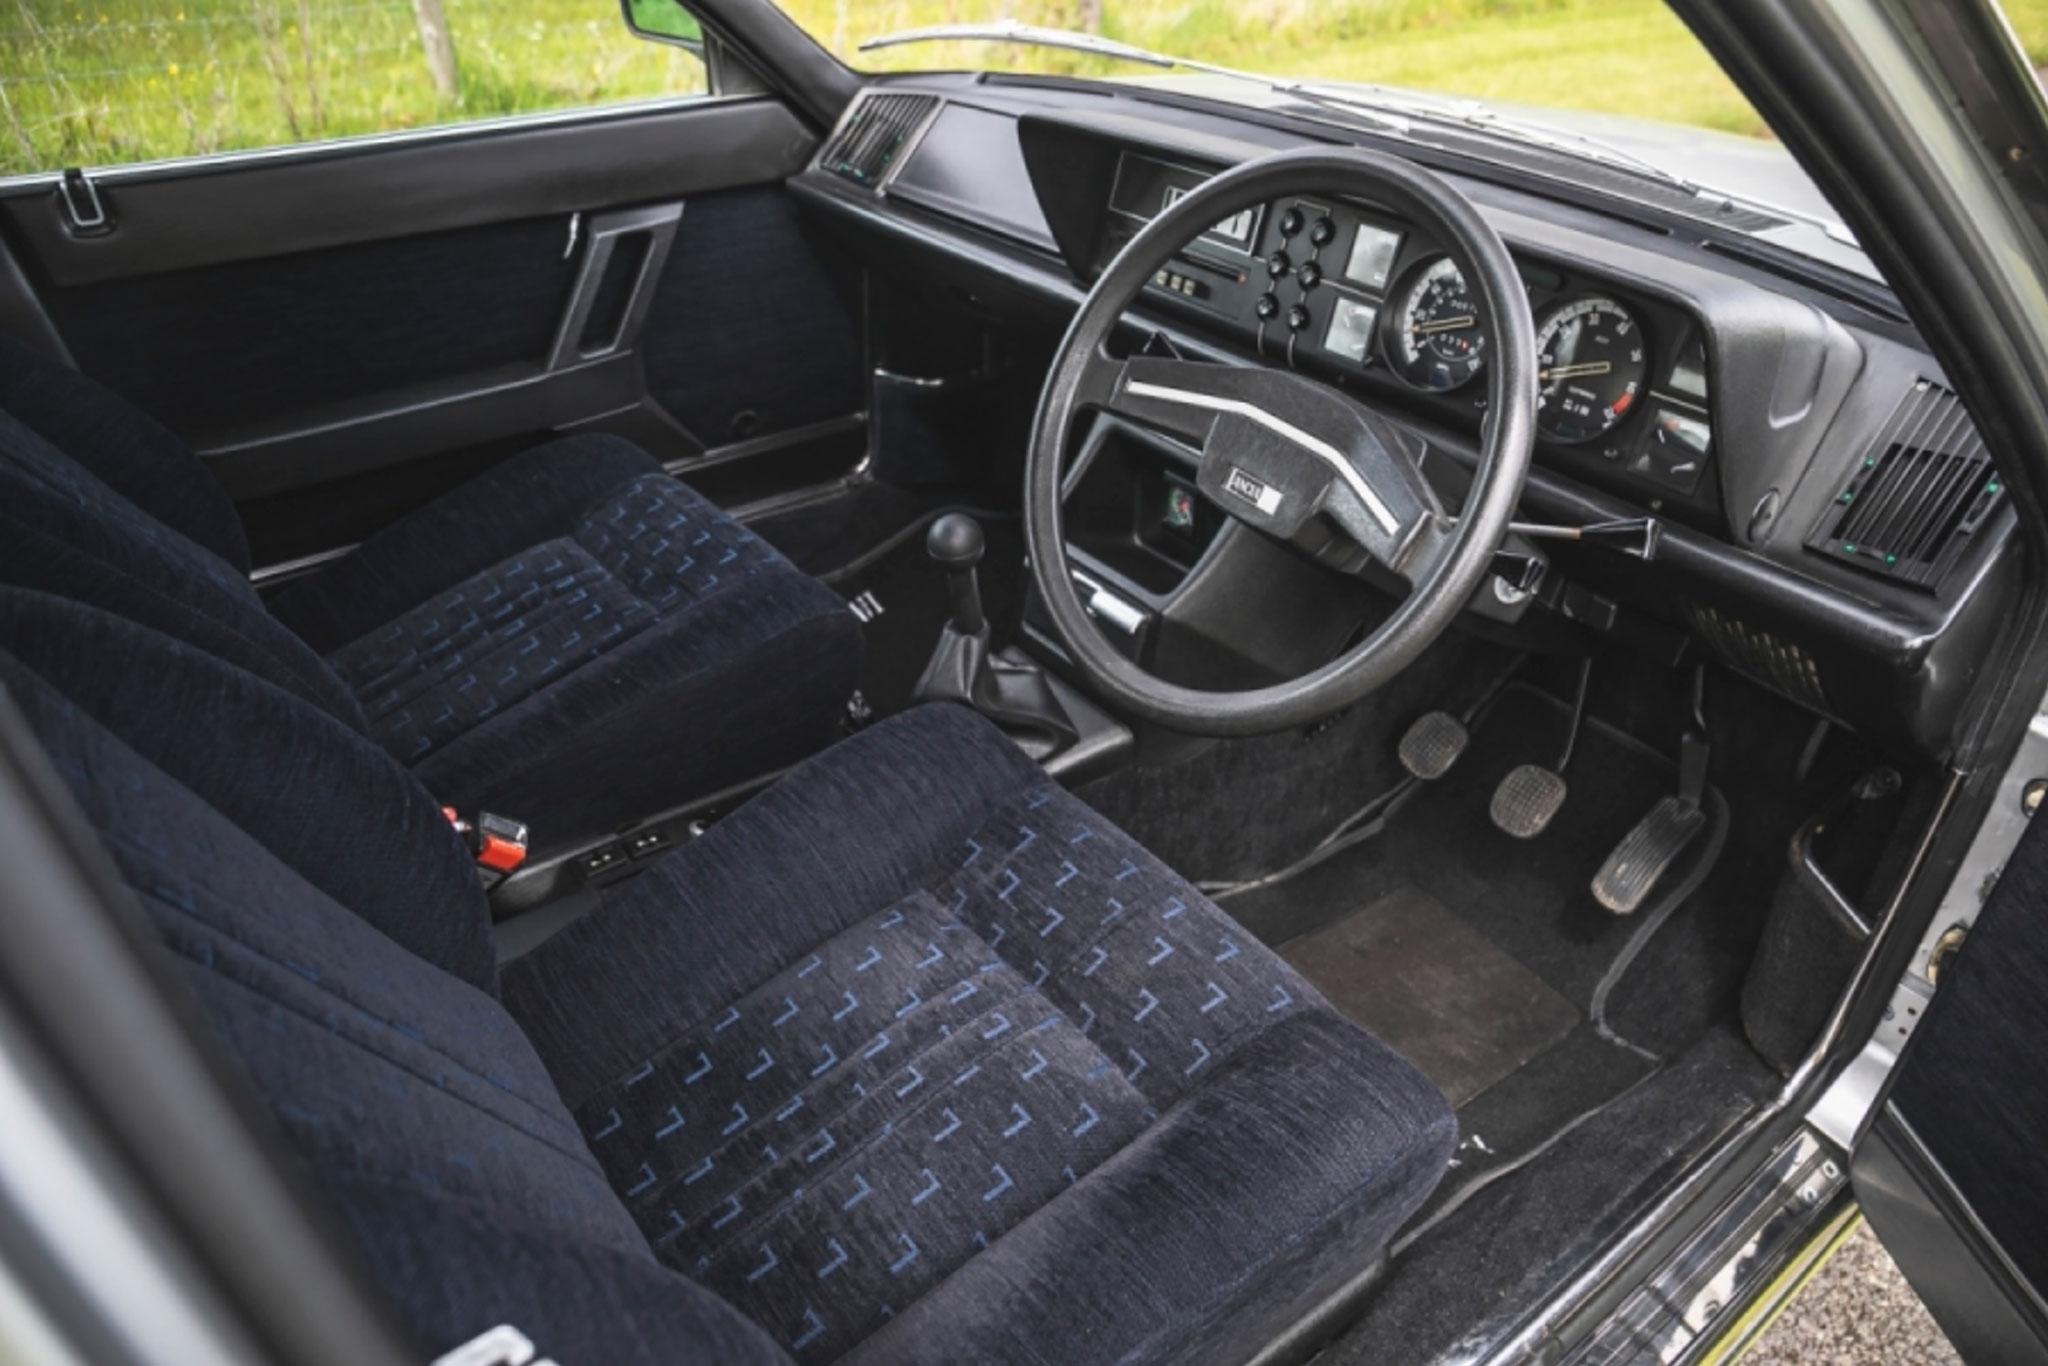 1976 Lancia Gamma Berlina 2500 intérieur - CCA au London Classic Car Show 2021.